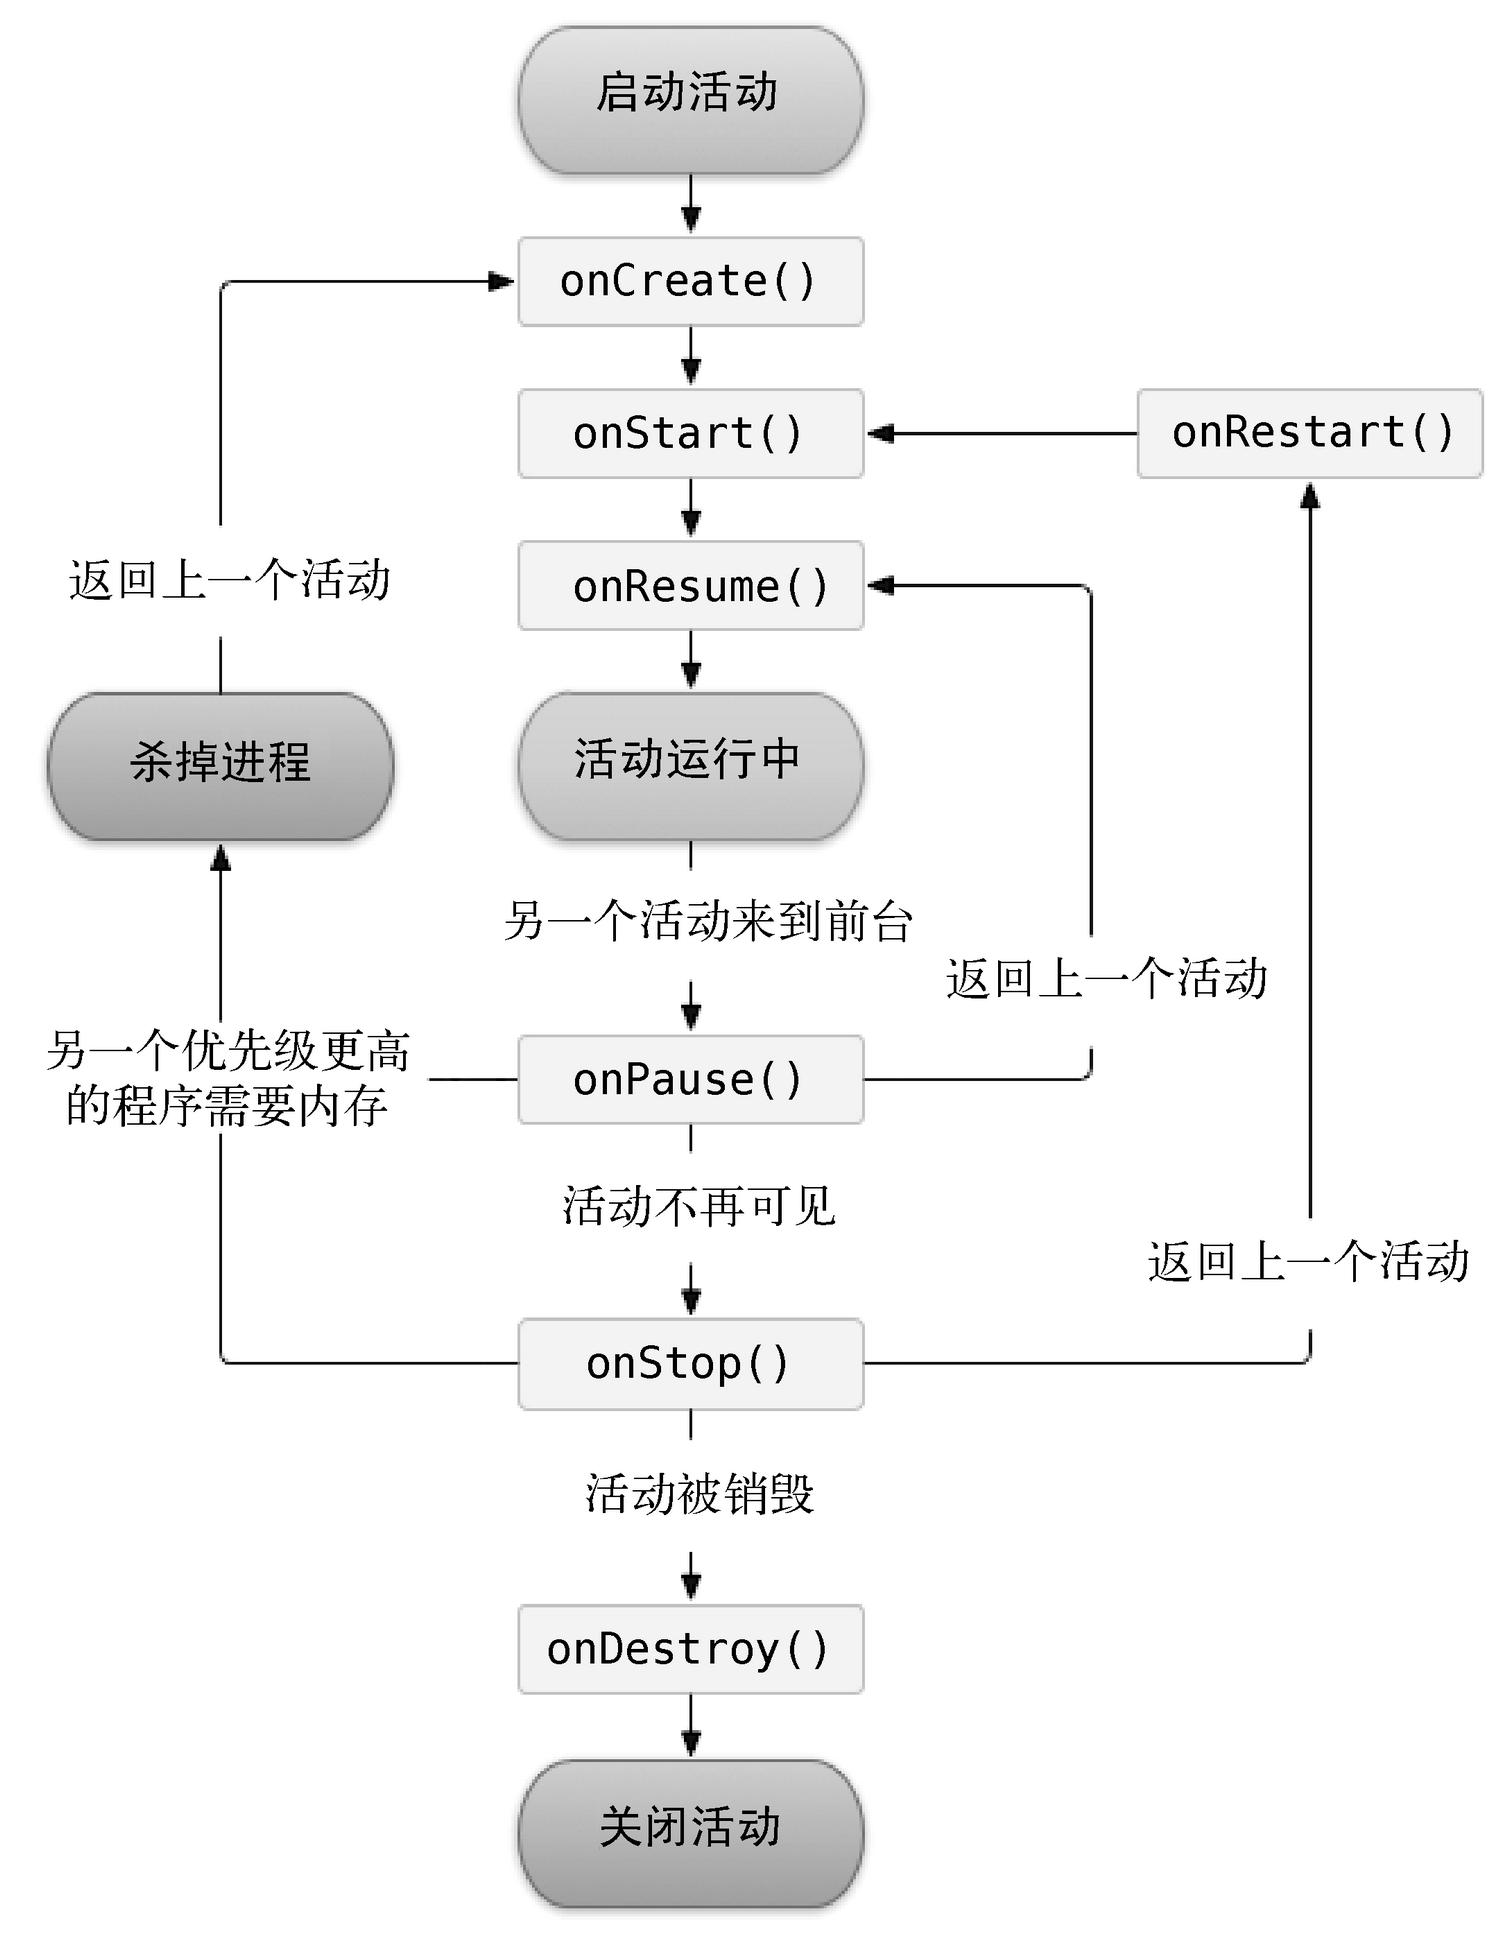 第一行代码:Android(2nd ed)(38):先从看得到的入手——探究活动 2.4.3